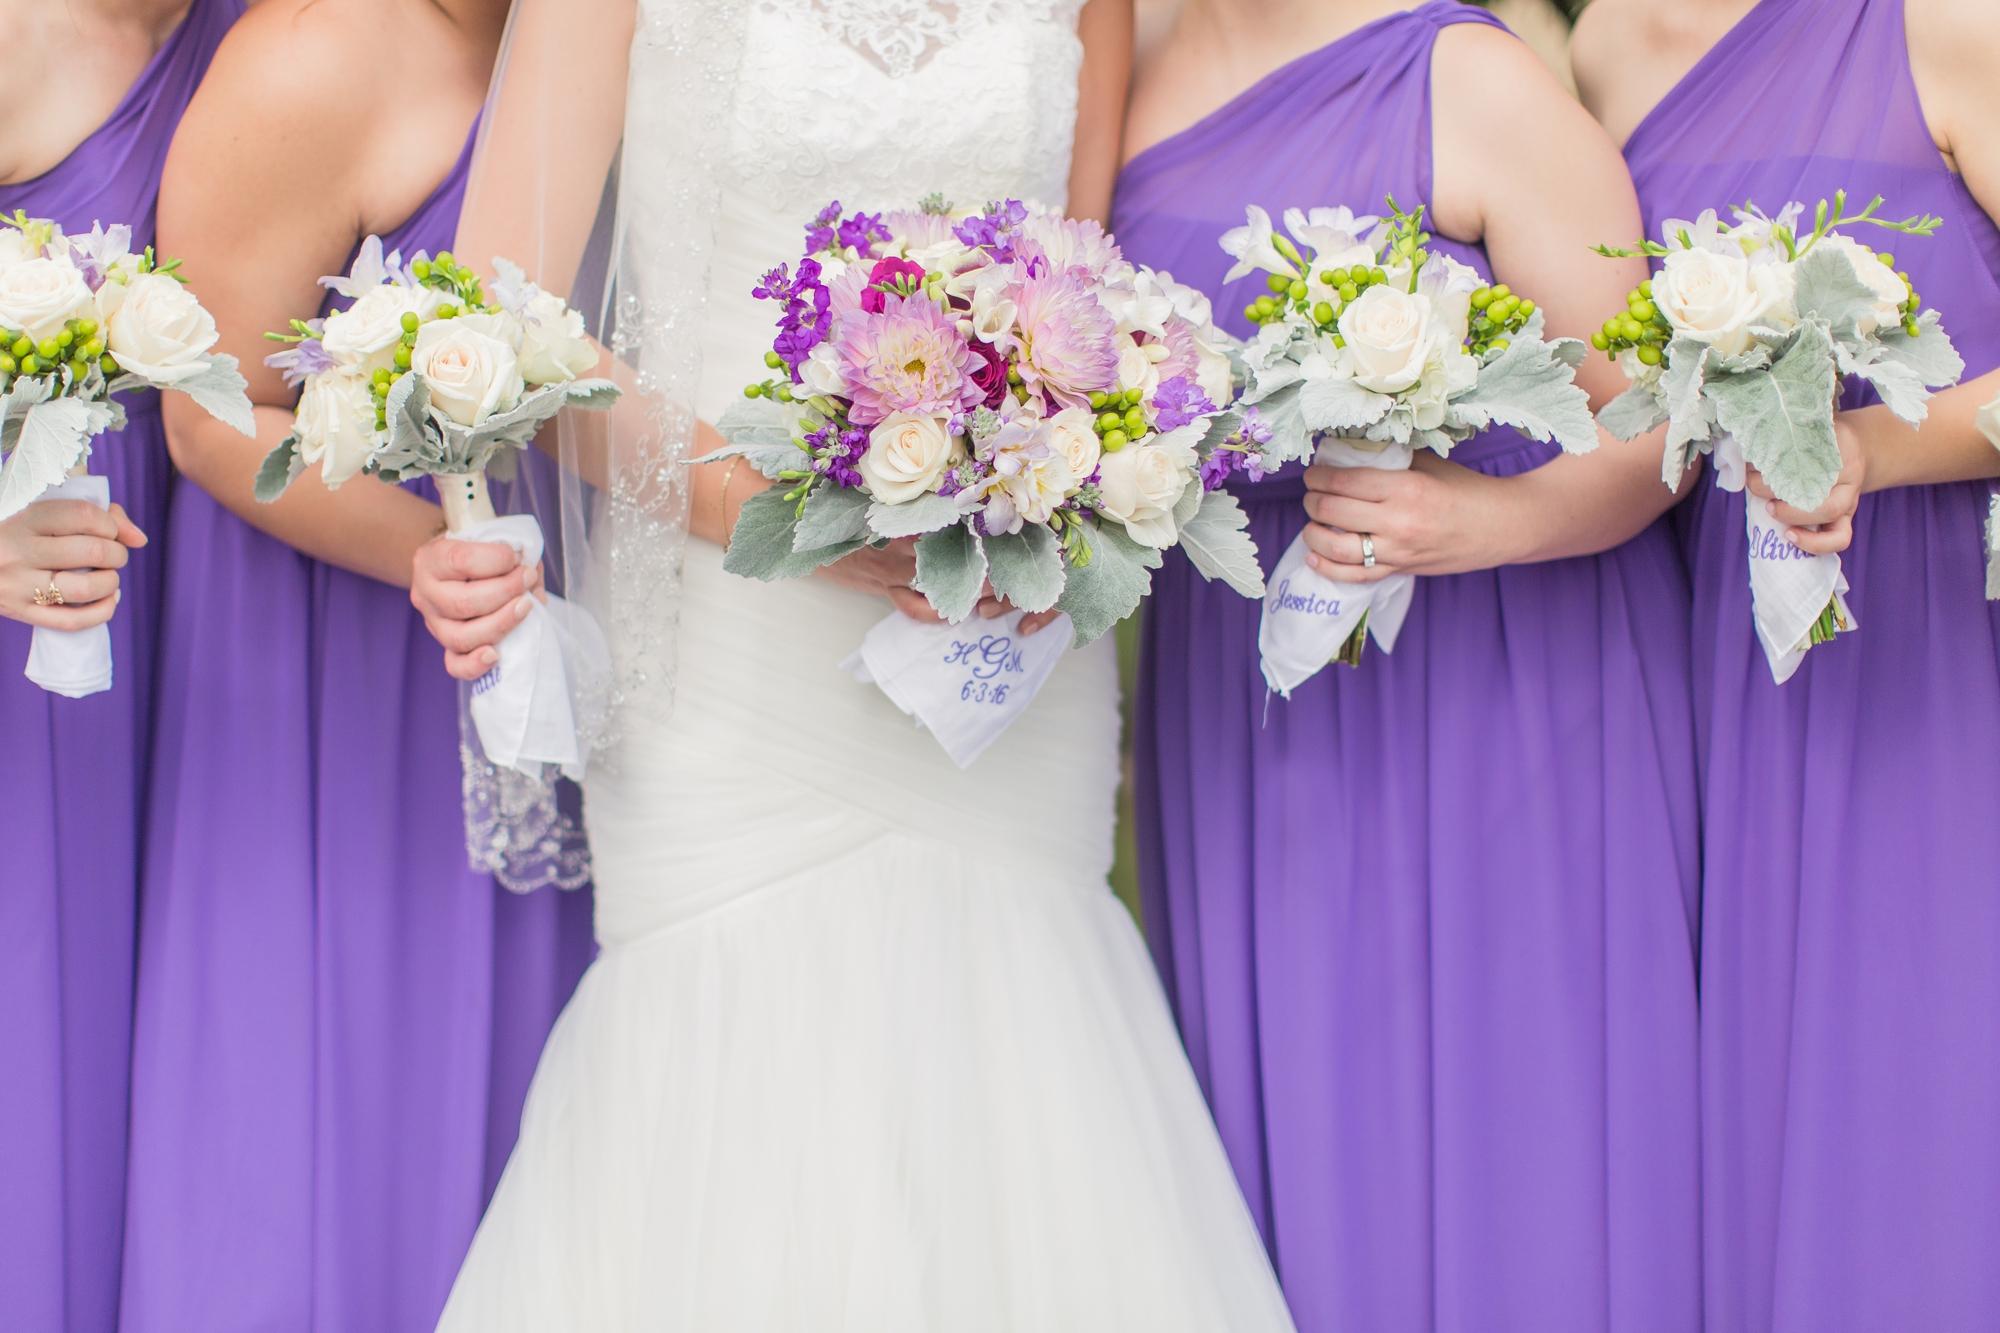 gaywedding-169.jpg